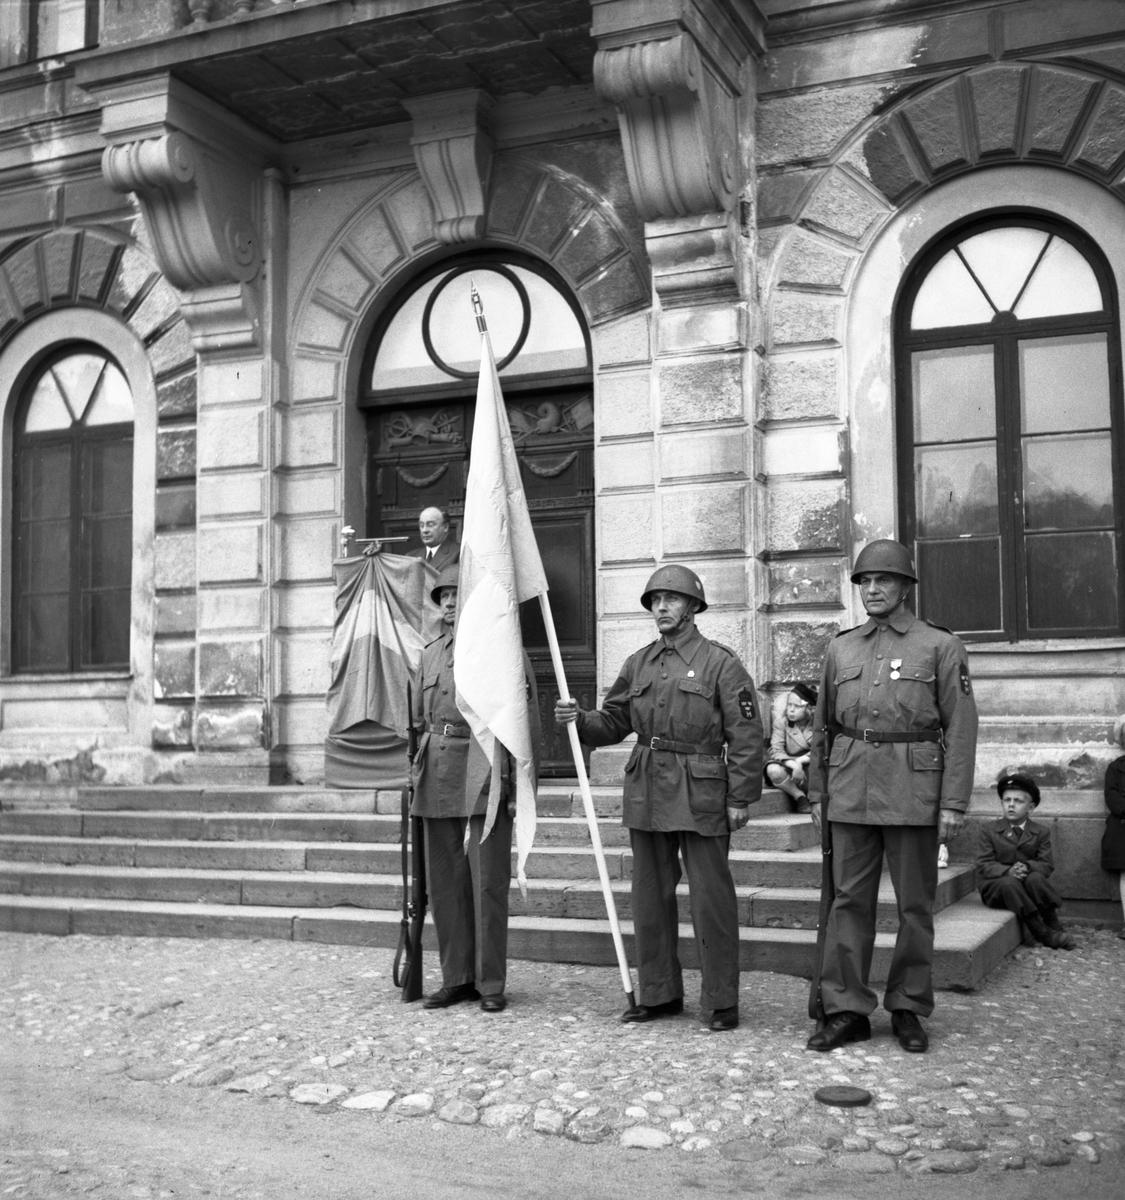 Hemvärnet femårs-jubileum. 1945